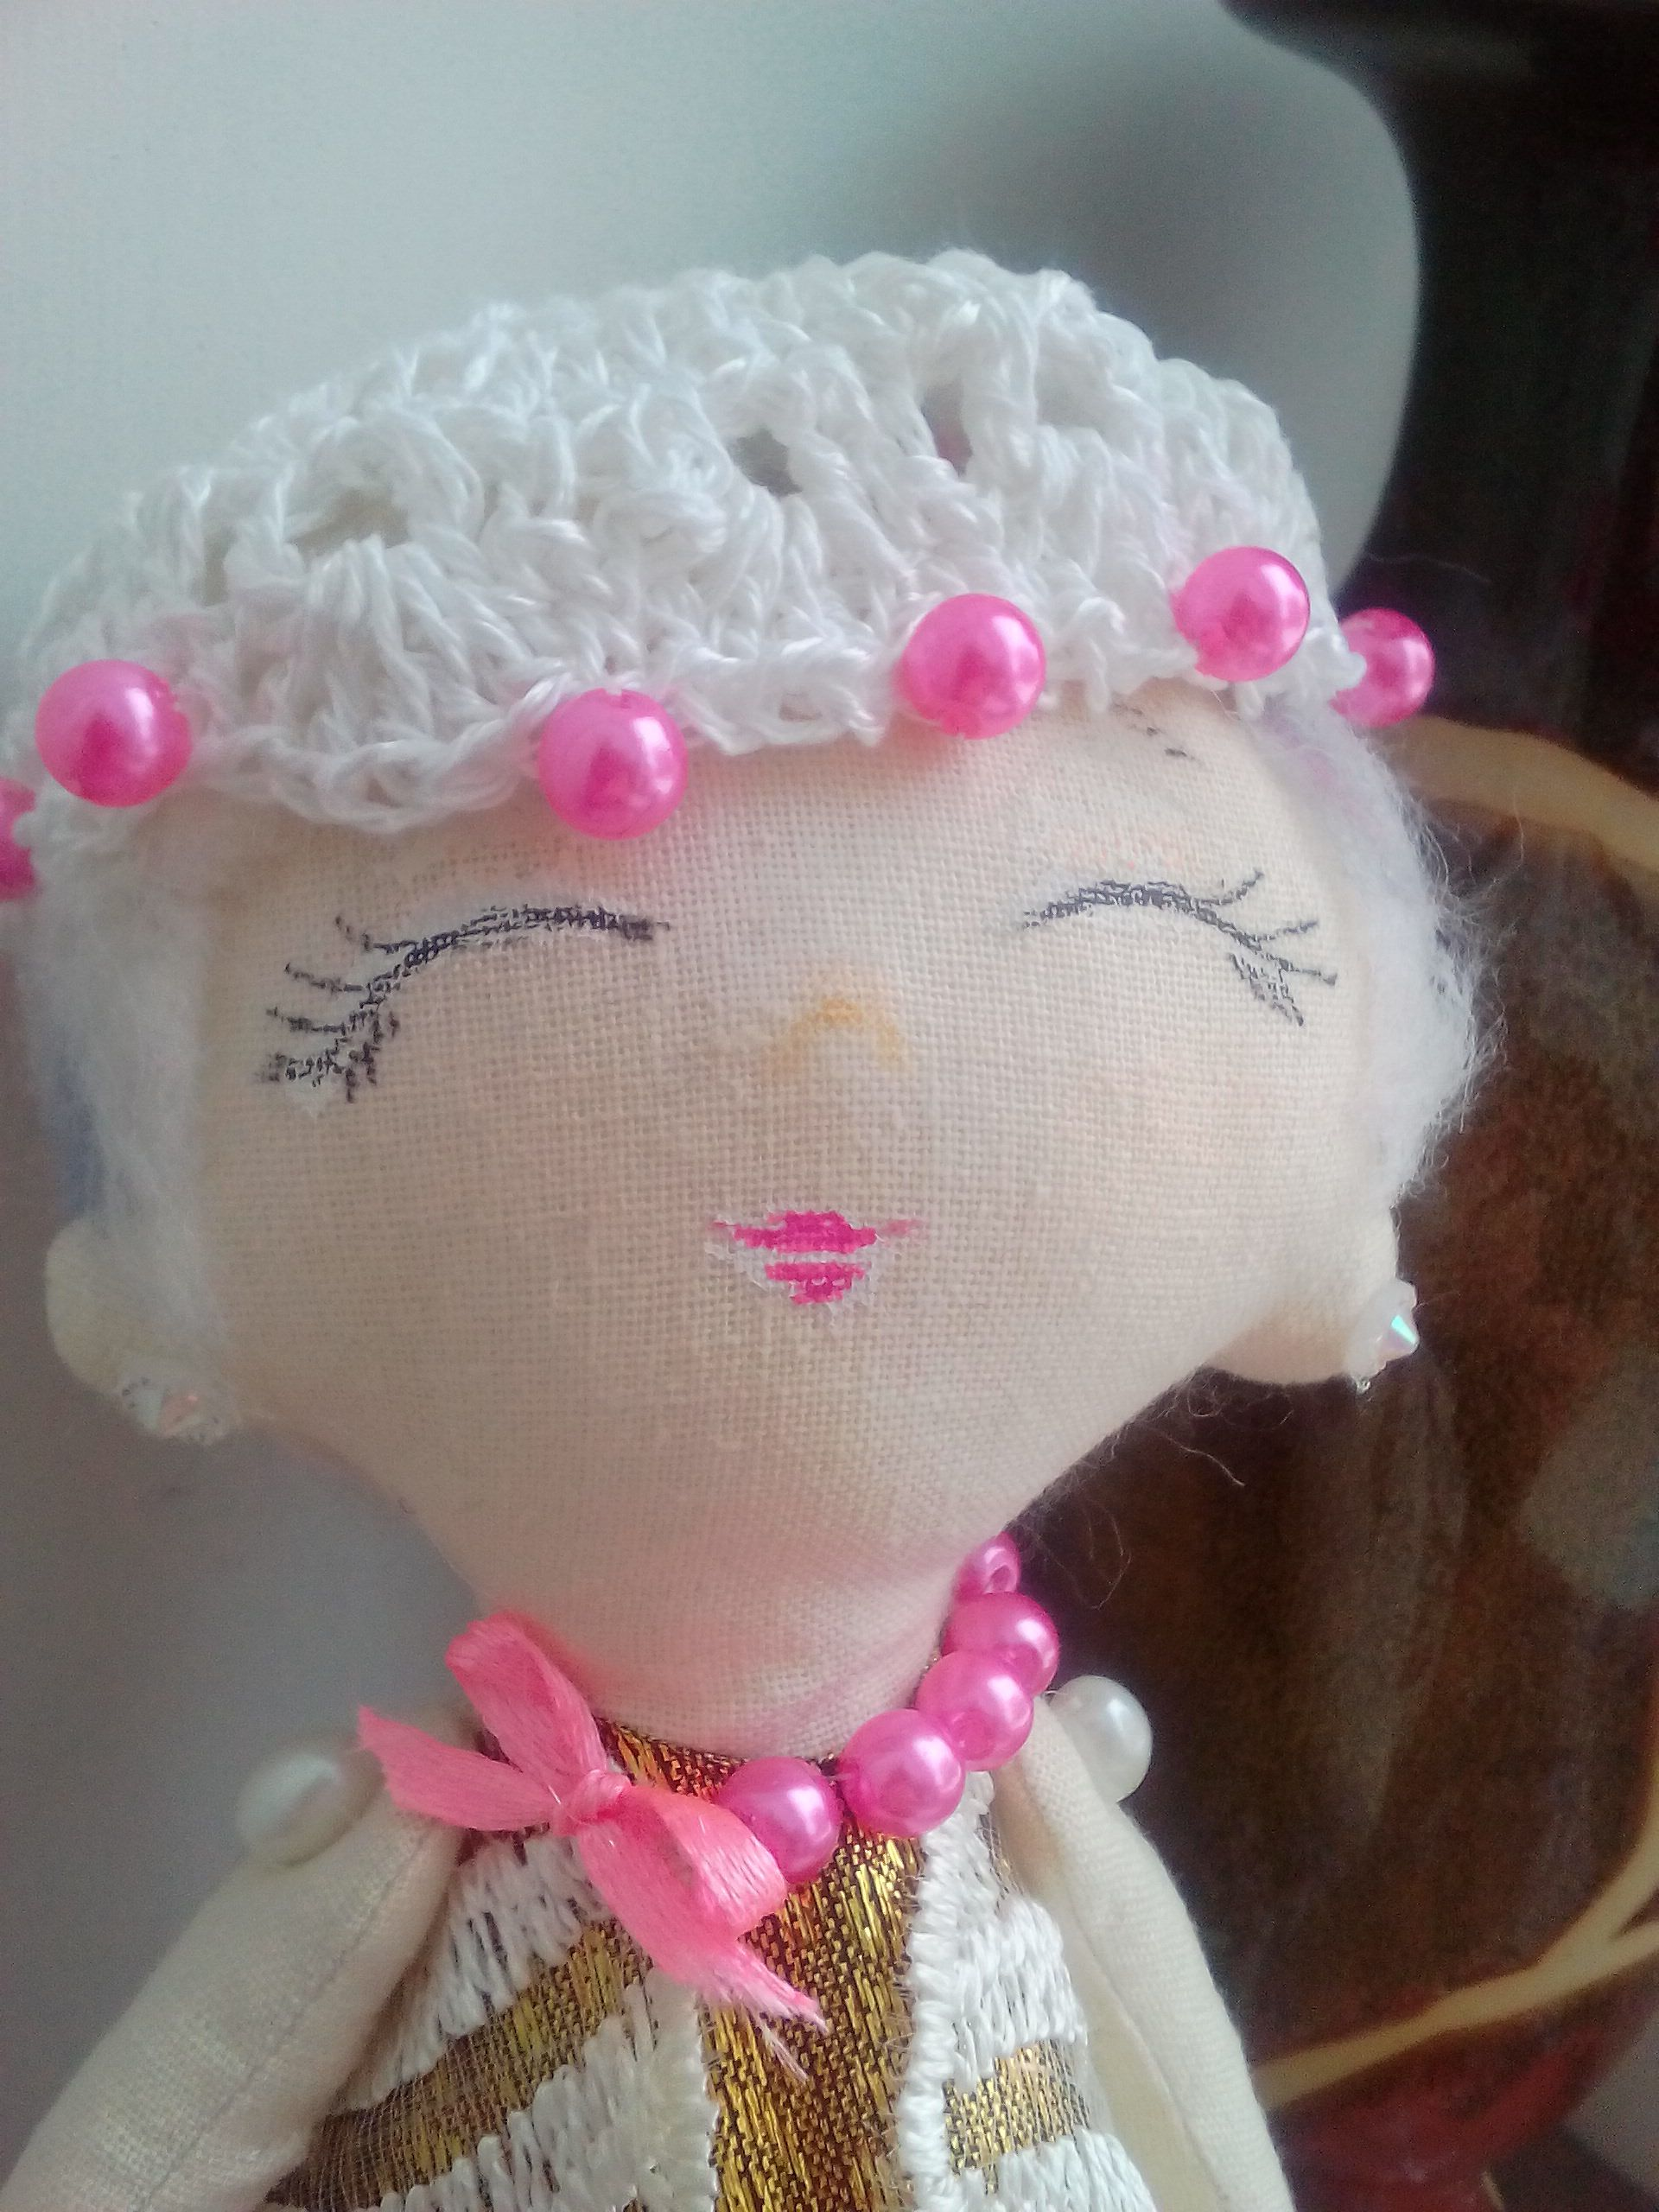 handmade игрушка кукла текстильнаякукла ручнаяработа подарок